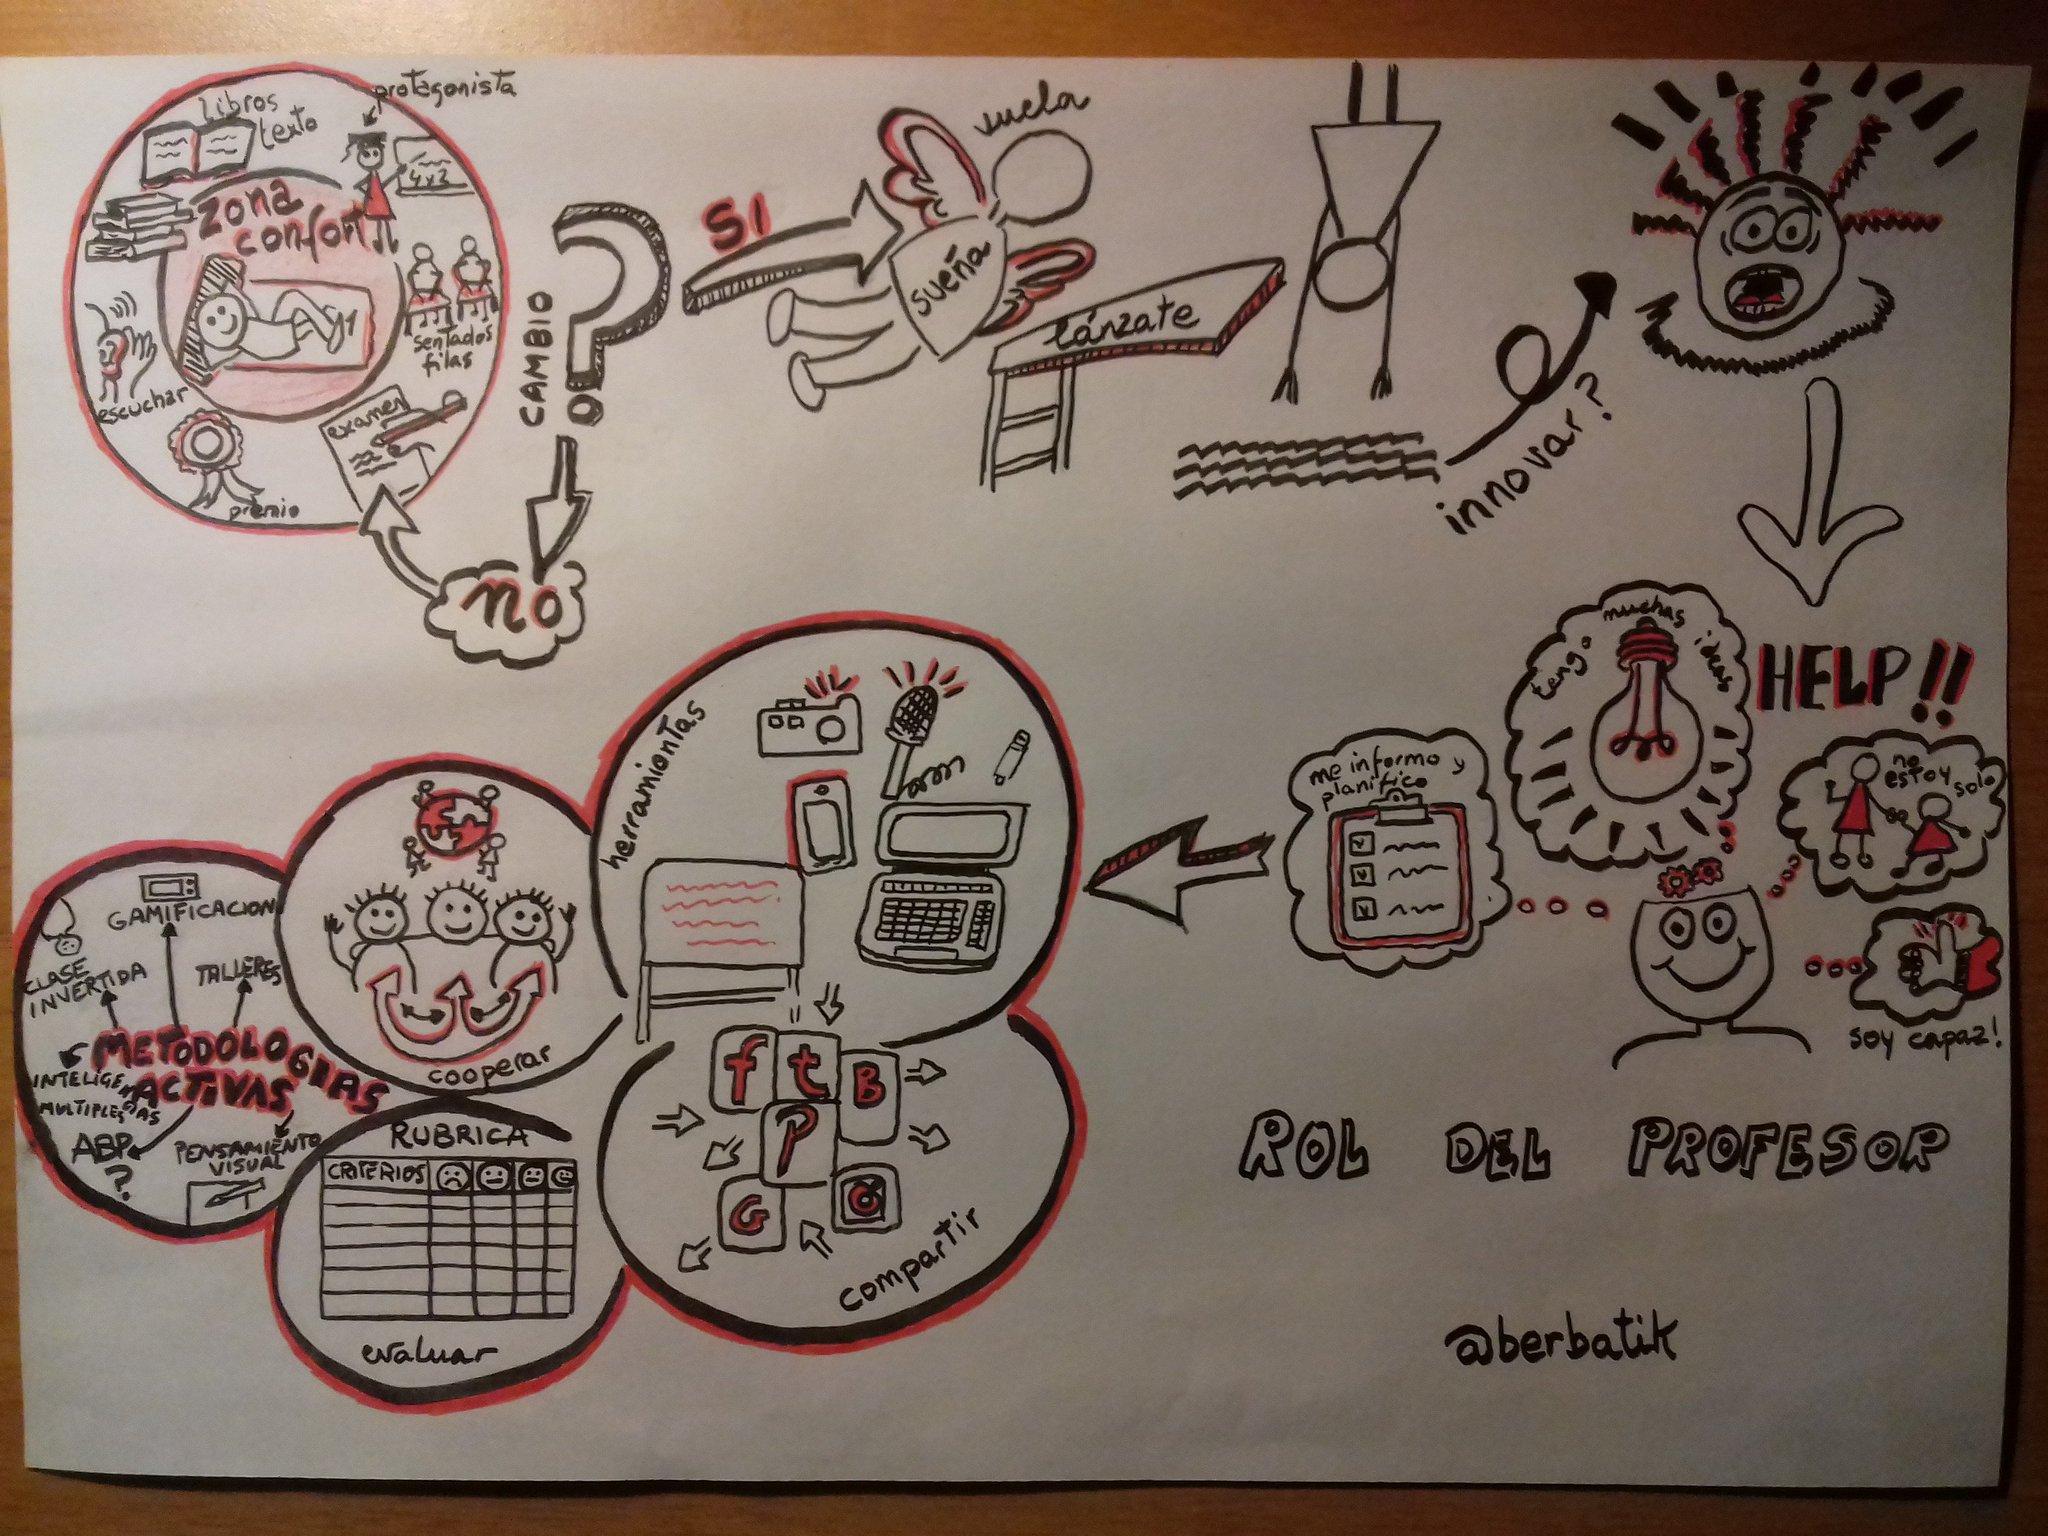 #pensarvisual reto publicado, esperando evaluación https://t.co/JJwnubCN2G